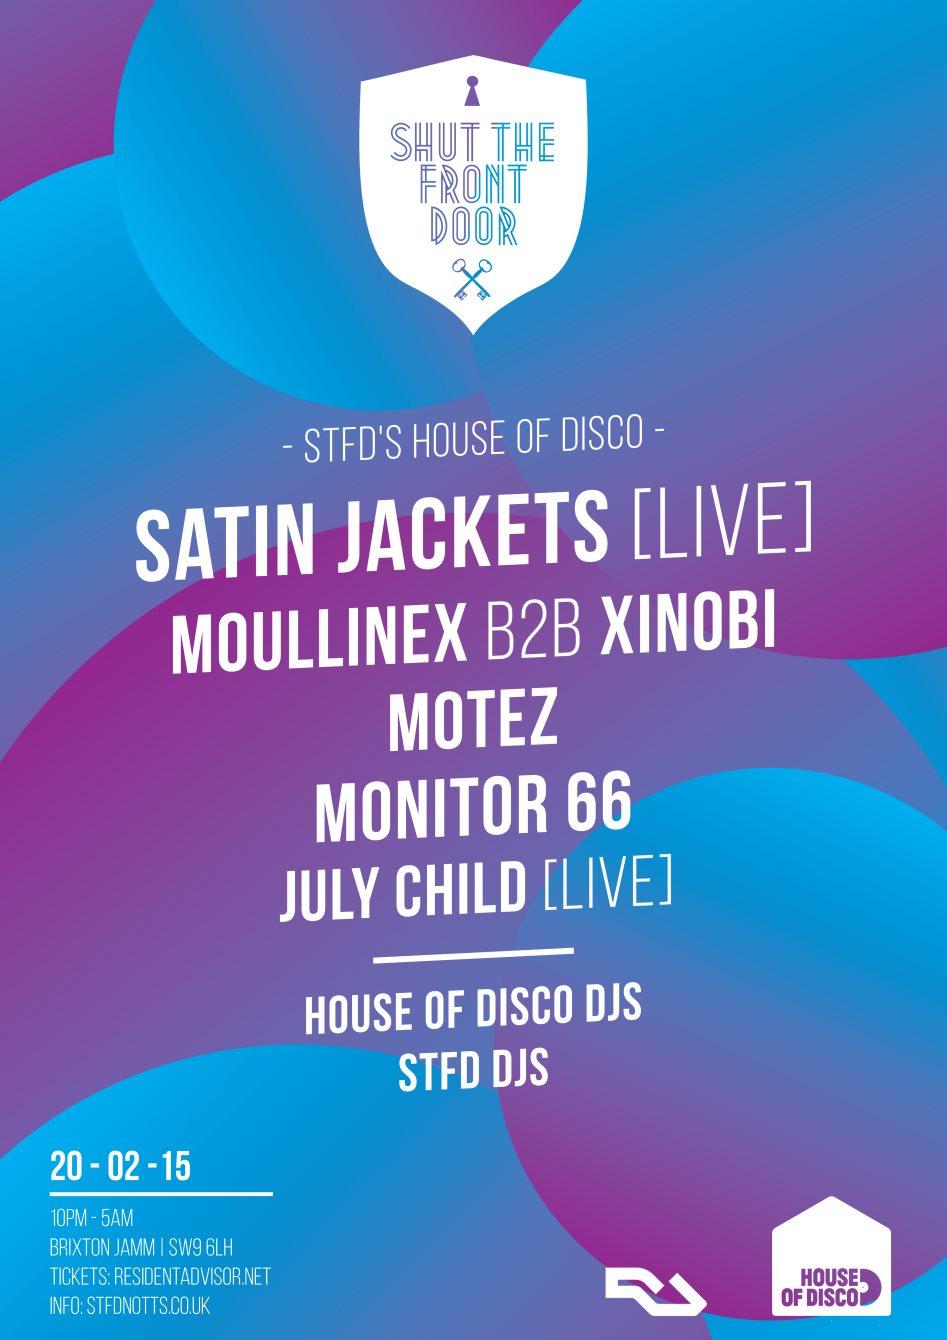 Shut The Front Door: Satin Jackets (Live), Moullinex b2b Xinobi, Motez - Flyer front